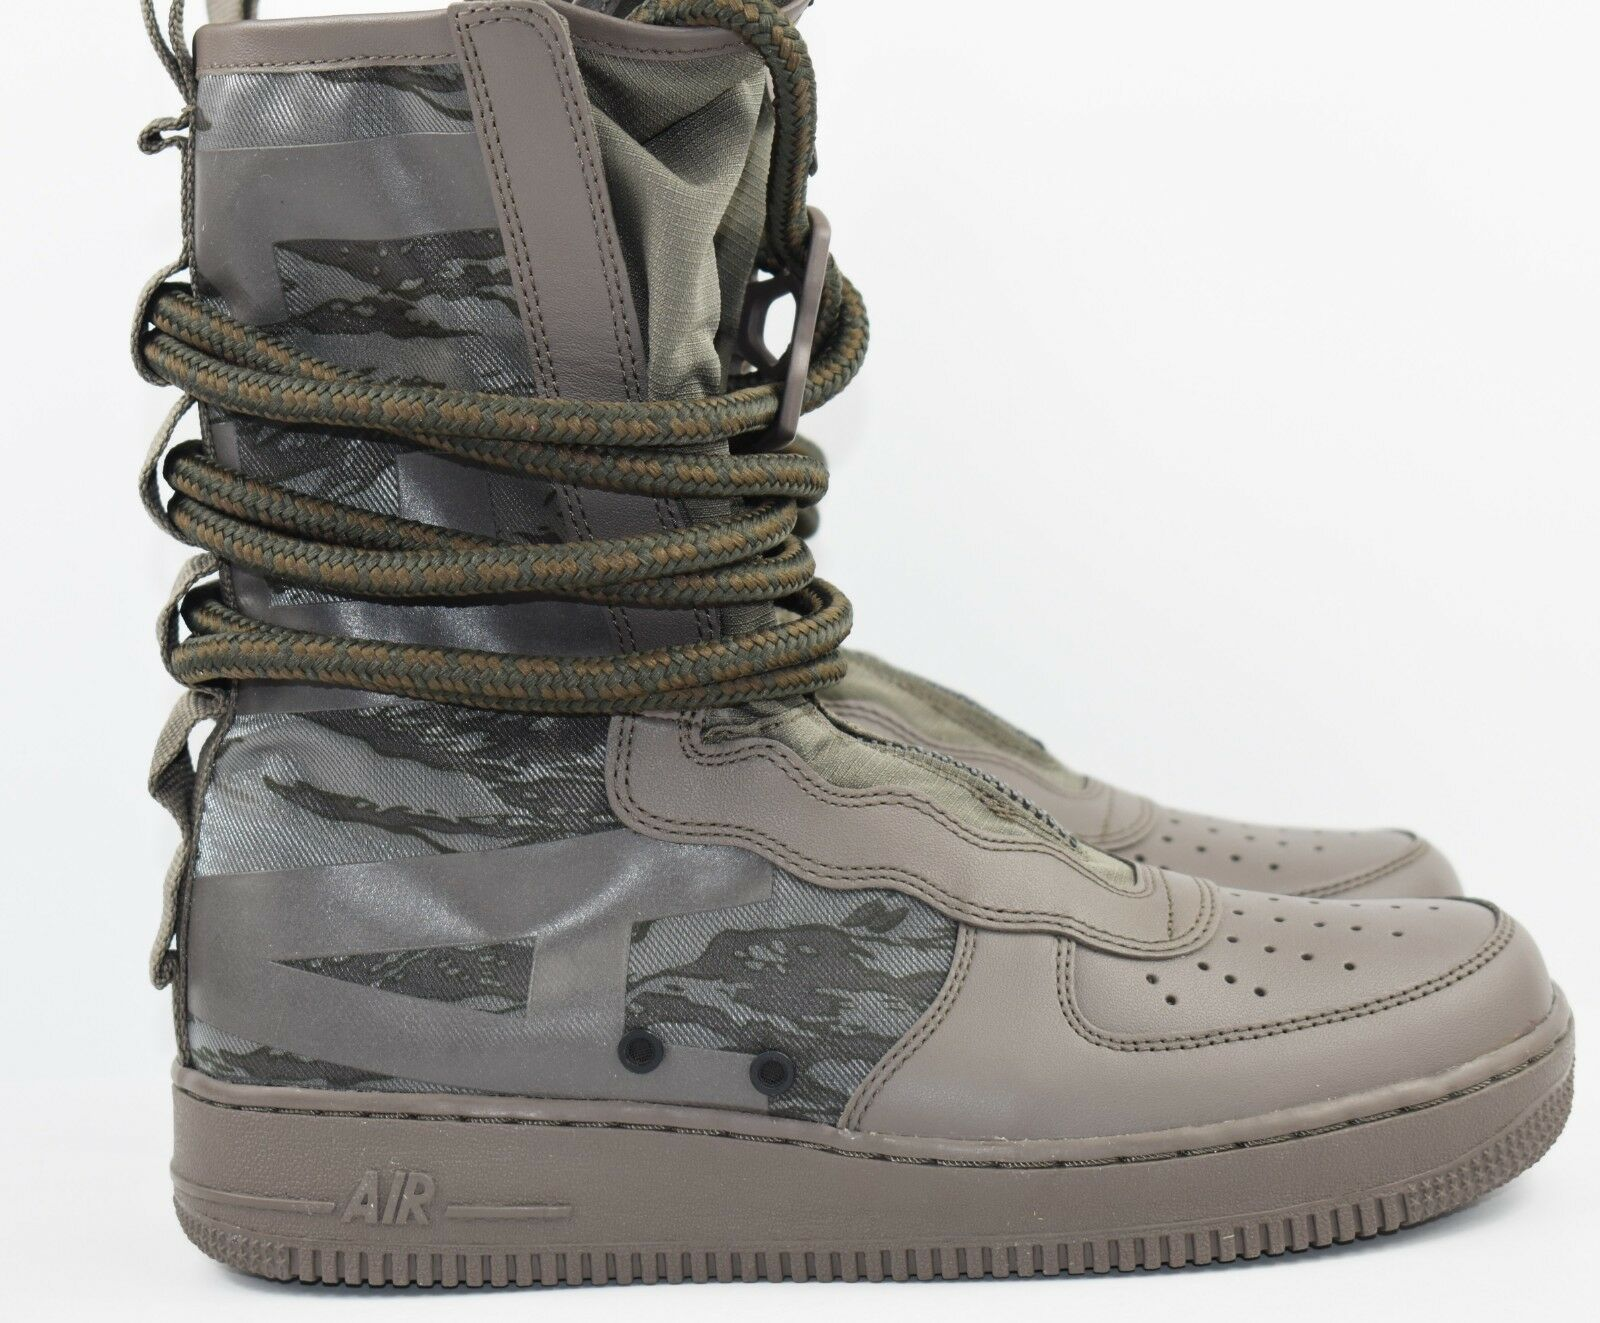 nike sf af1 salut domaine domaine domaine spécial hommes ridgerock noire taille 9 chaussures camouflage aa1128 203 4d4f83